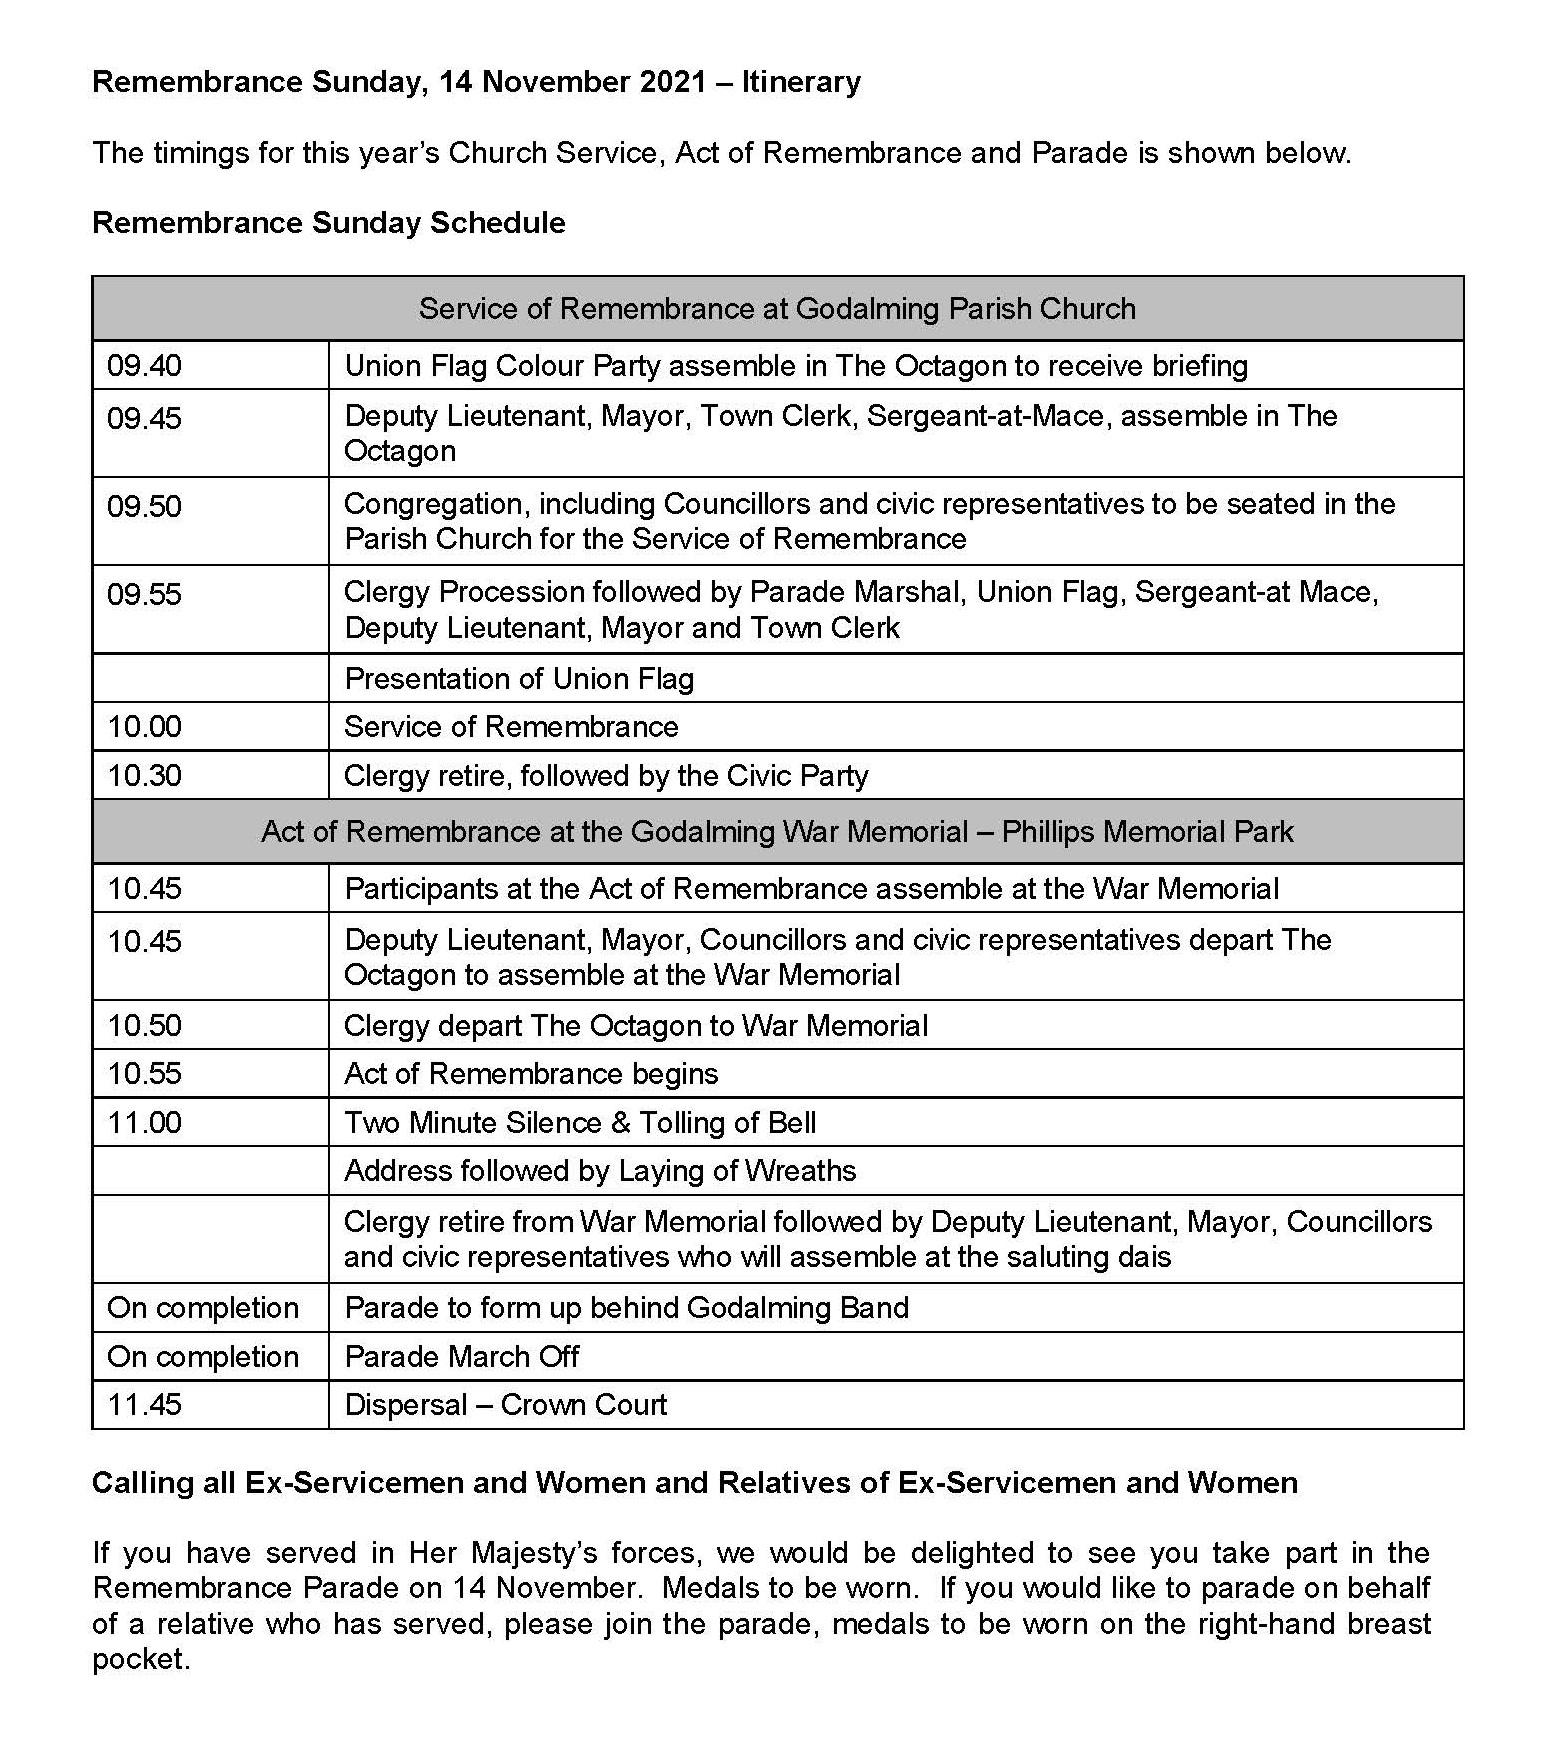 Remembrance Sunday Itinerary - 2021